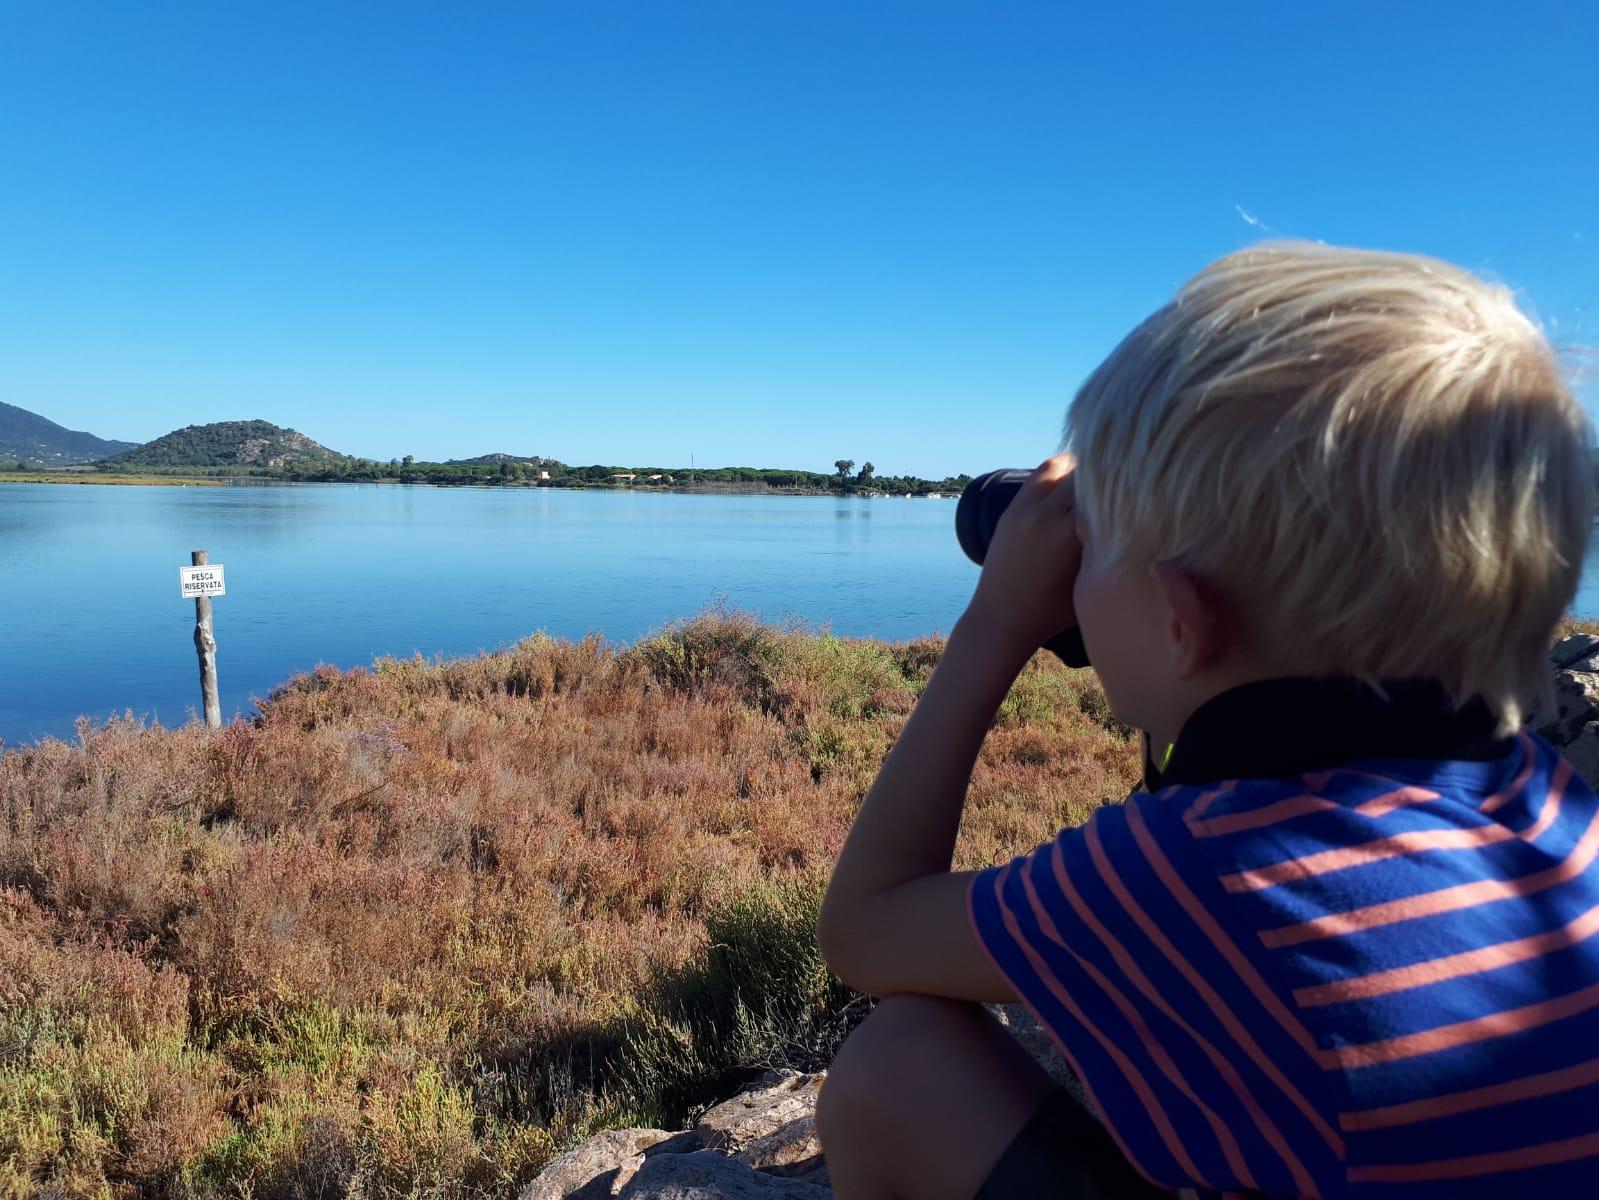 Settimane Sarde al Camping Capo Ferrato in Sardegna birdwatching